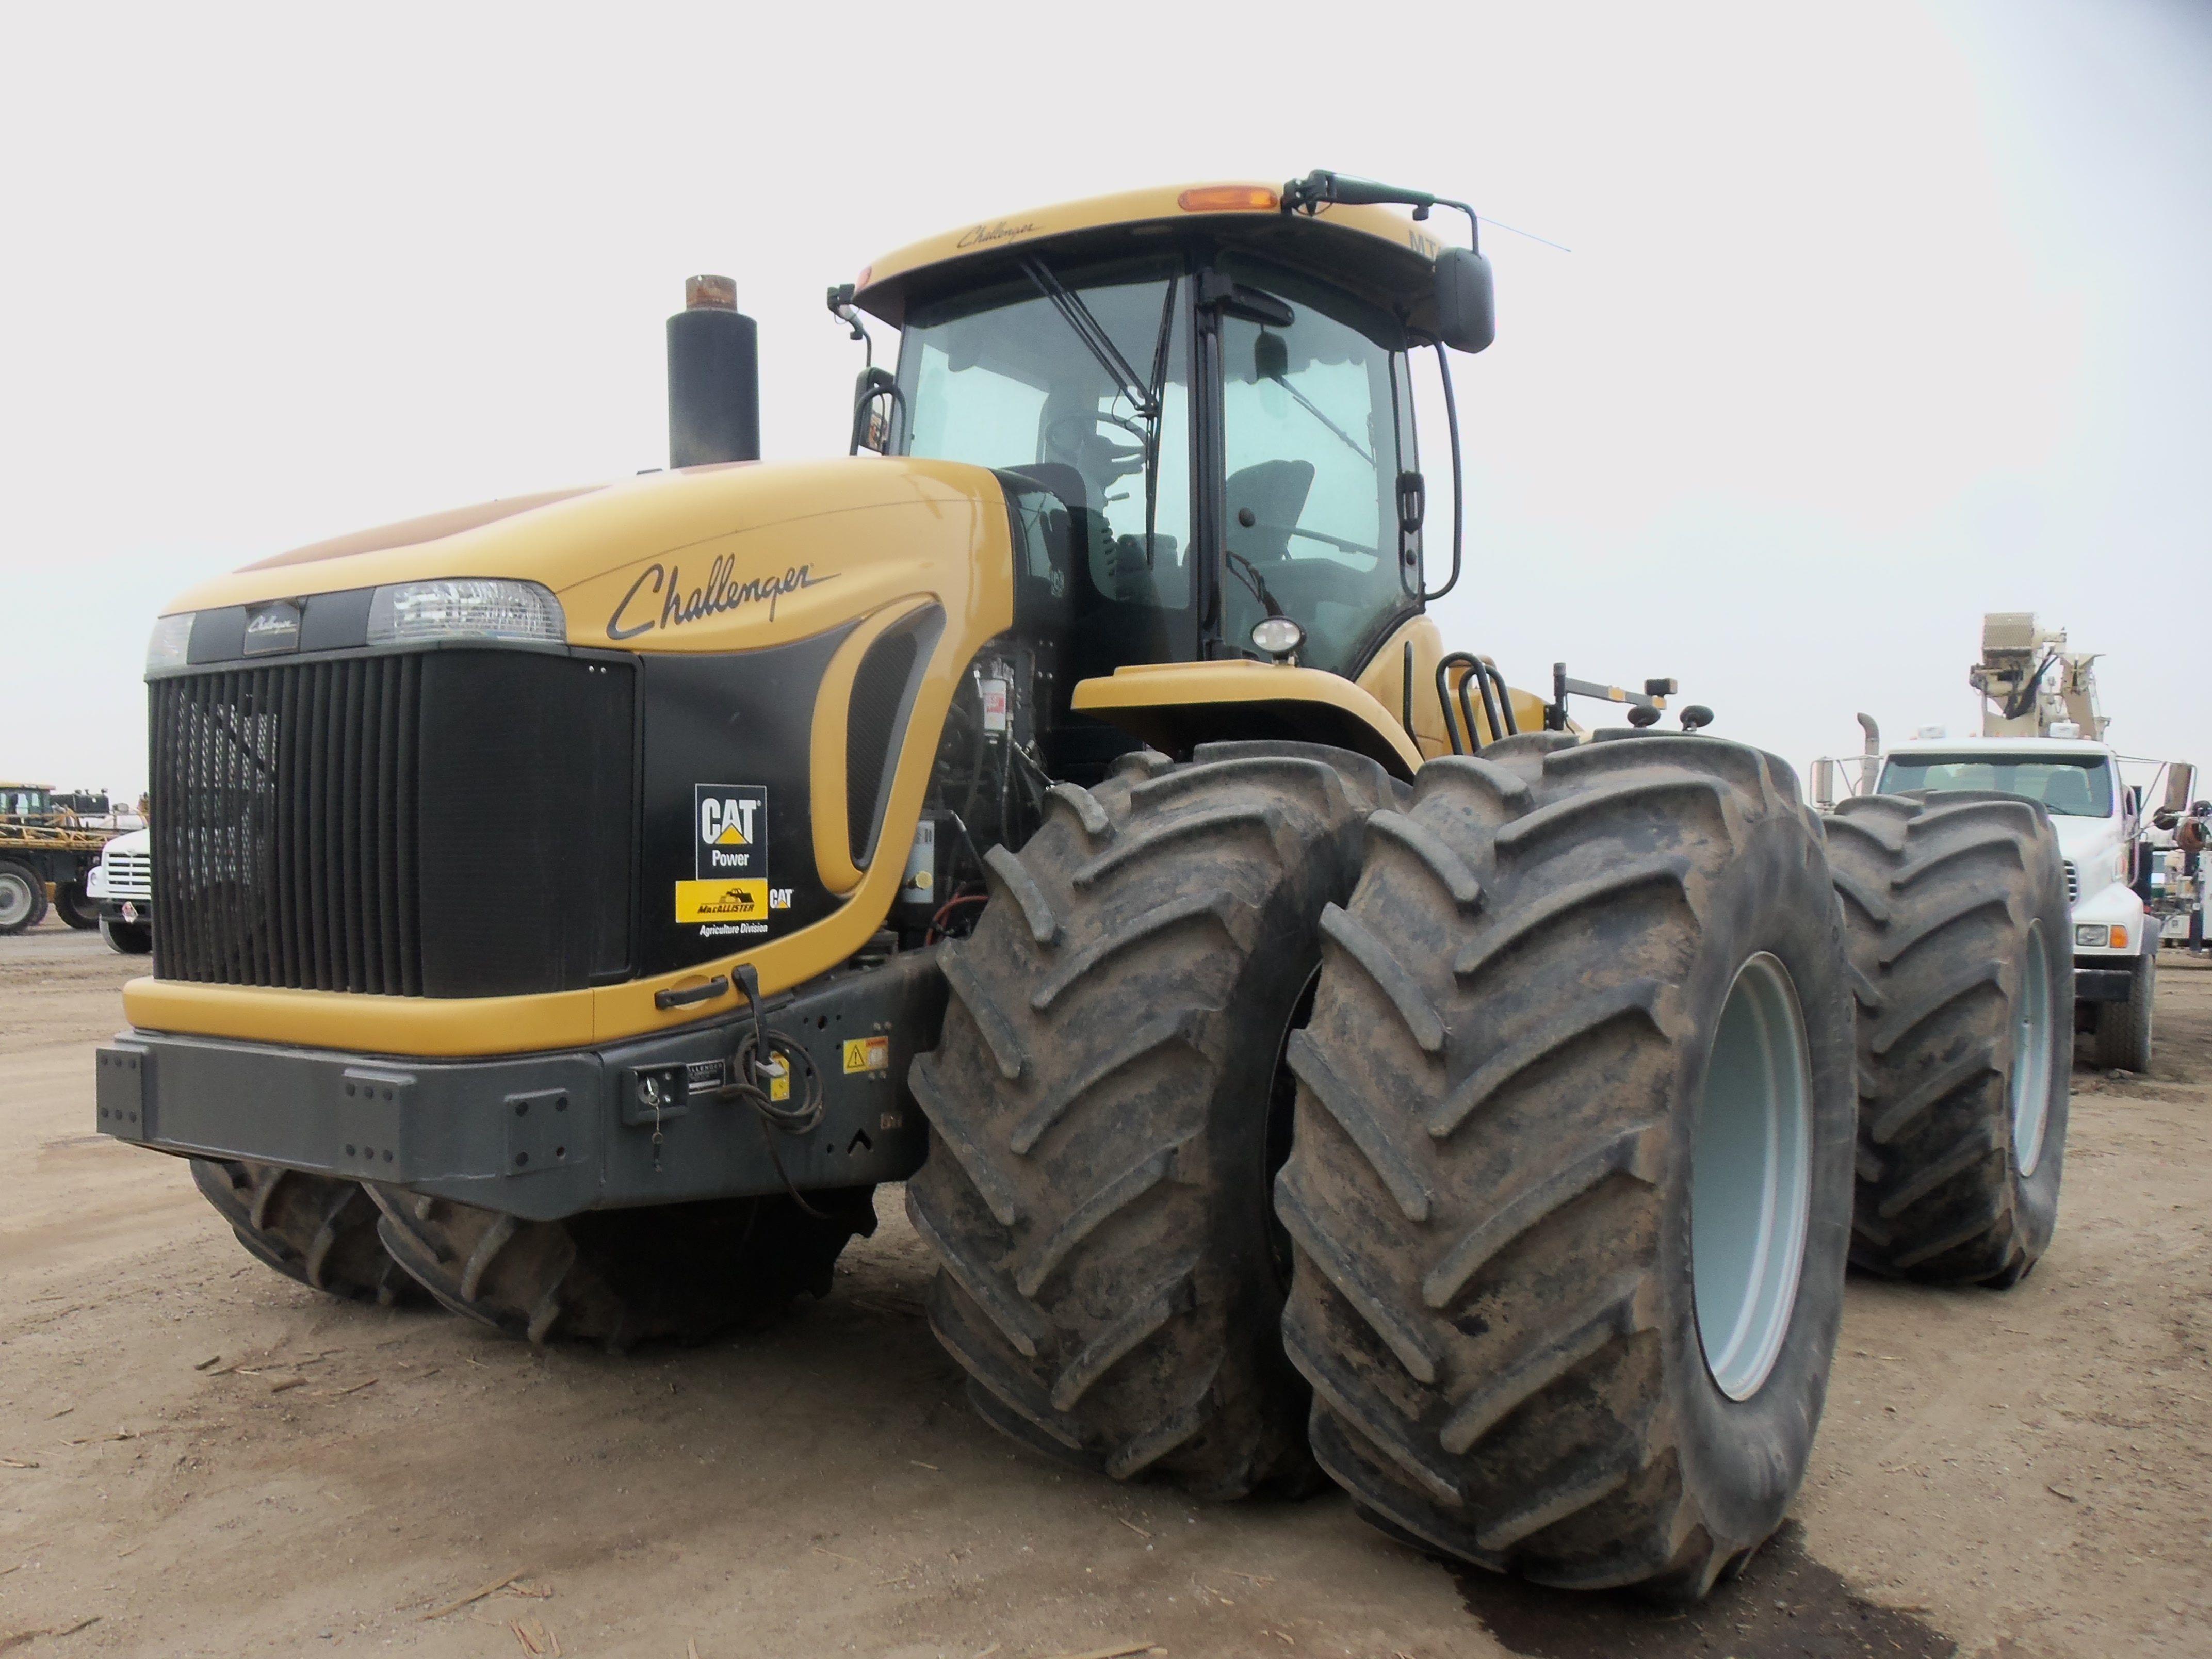 Challenger Mt965b 4 Wheel Drive Tractor Farm Equipment